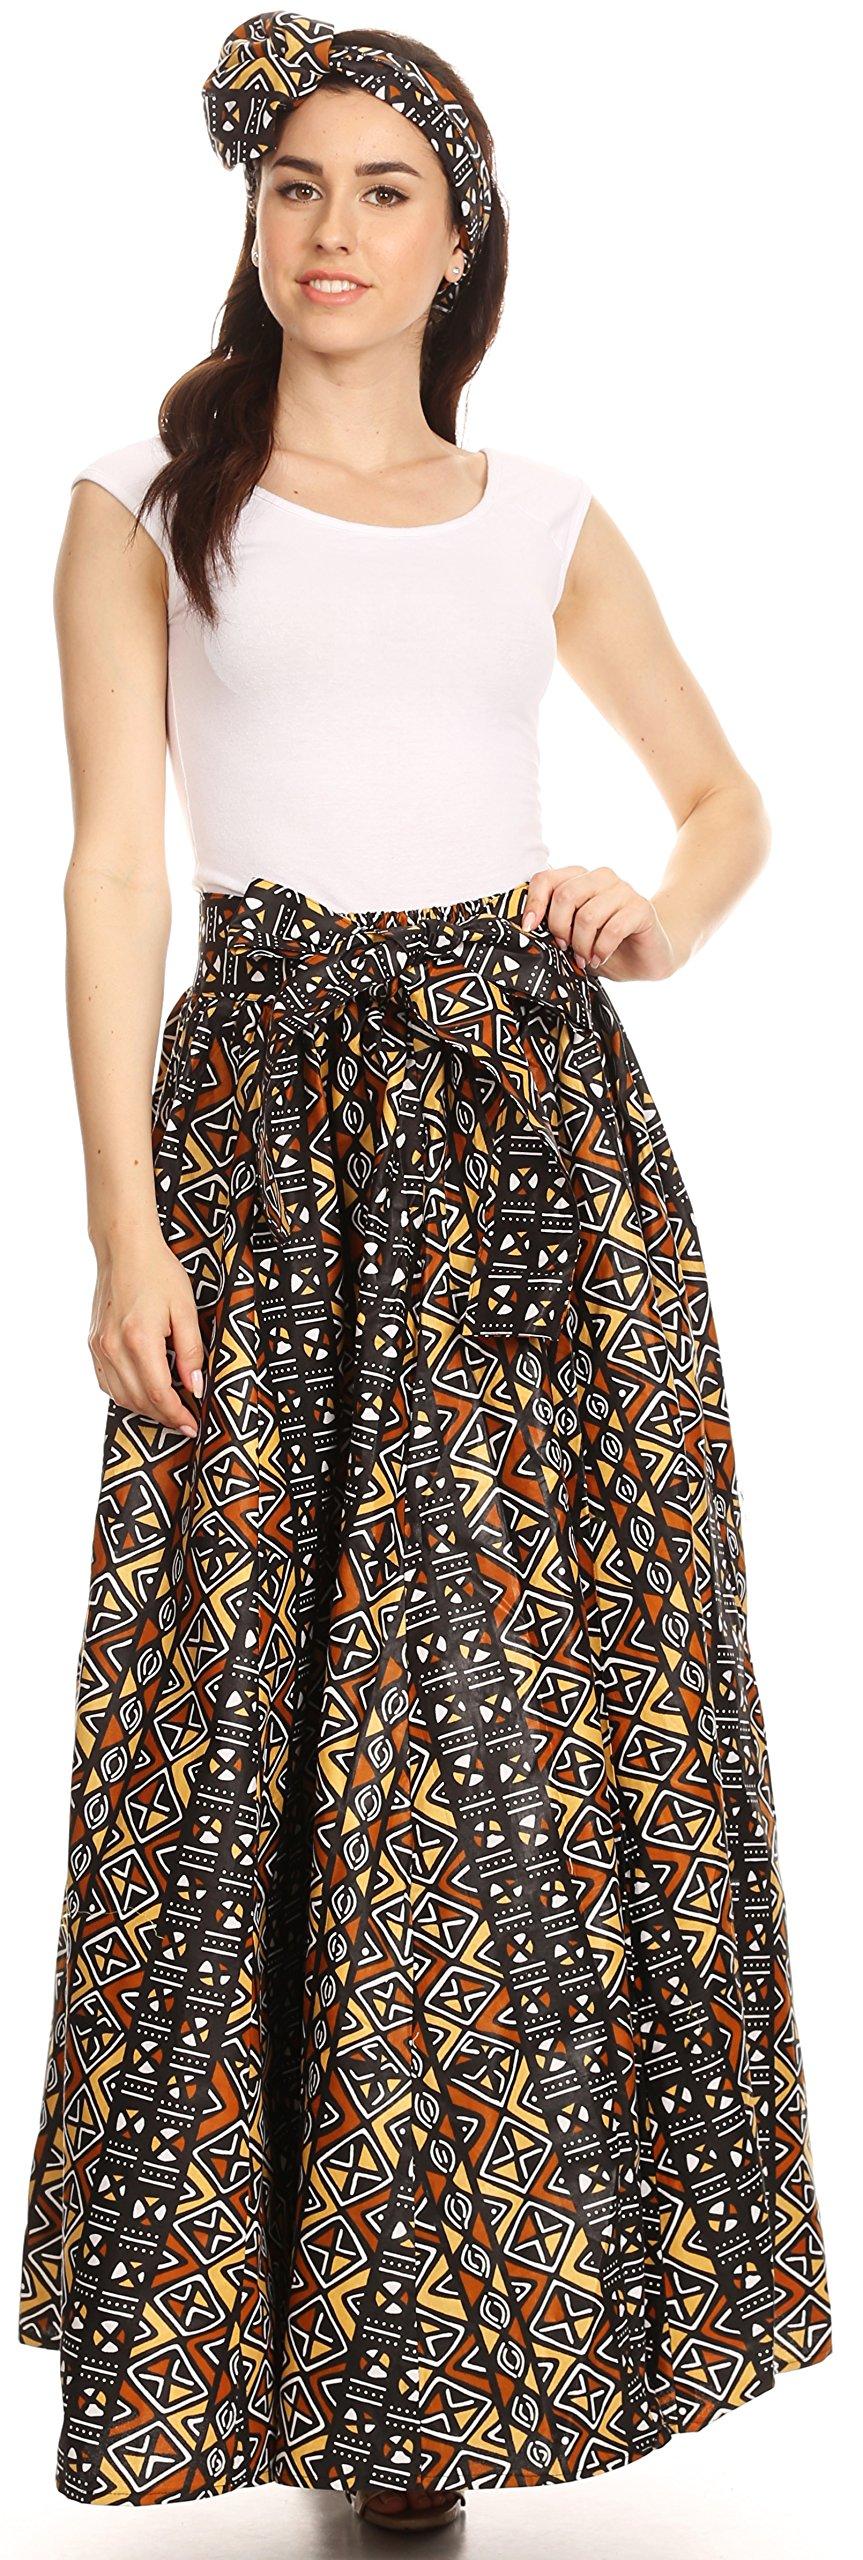 Sakkas 16317 - Asma Convertible Traditional Wax Print Adjustable Strap Maxi Skirt   Dress - 1122-BlackMulti - OS